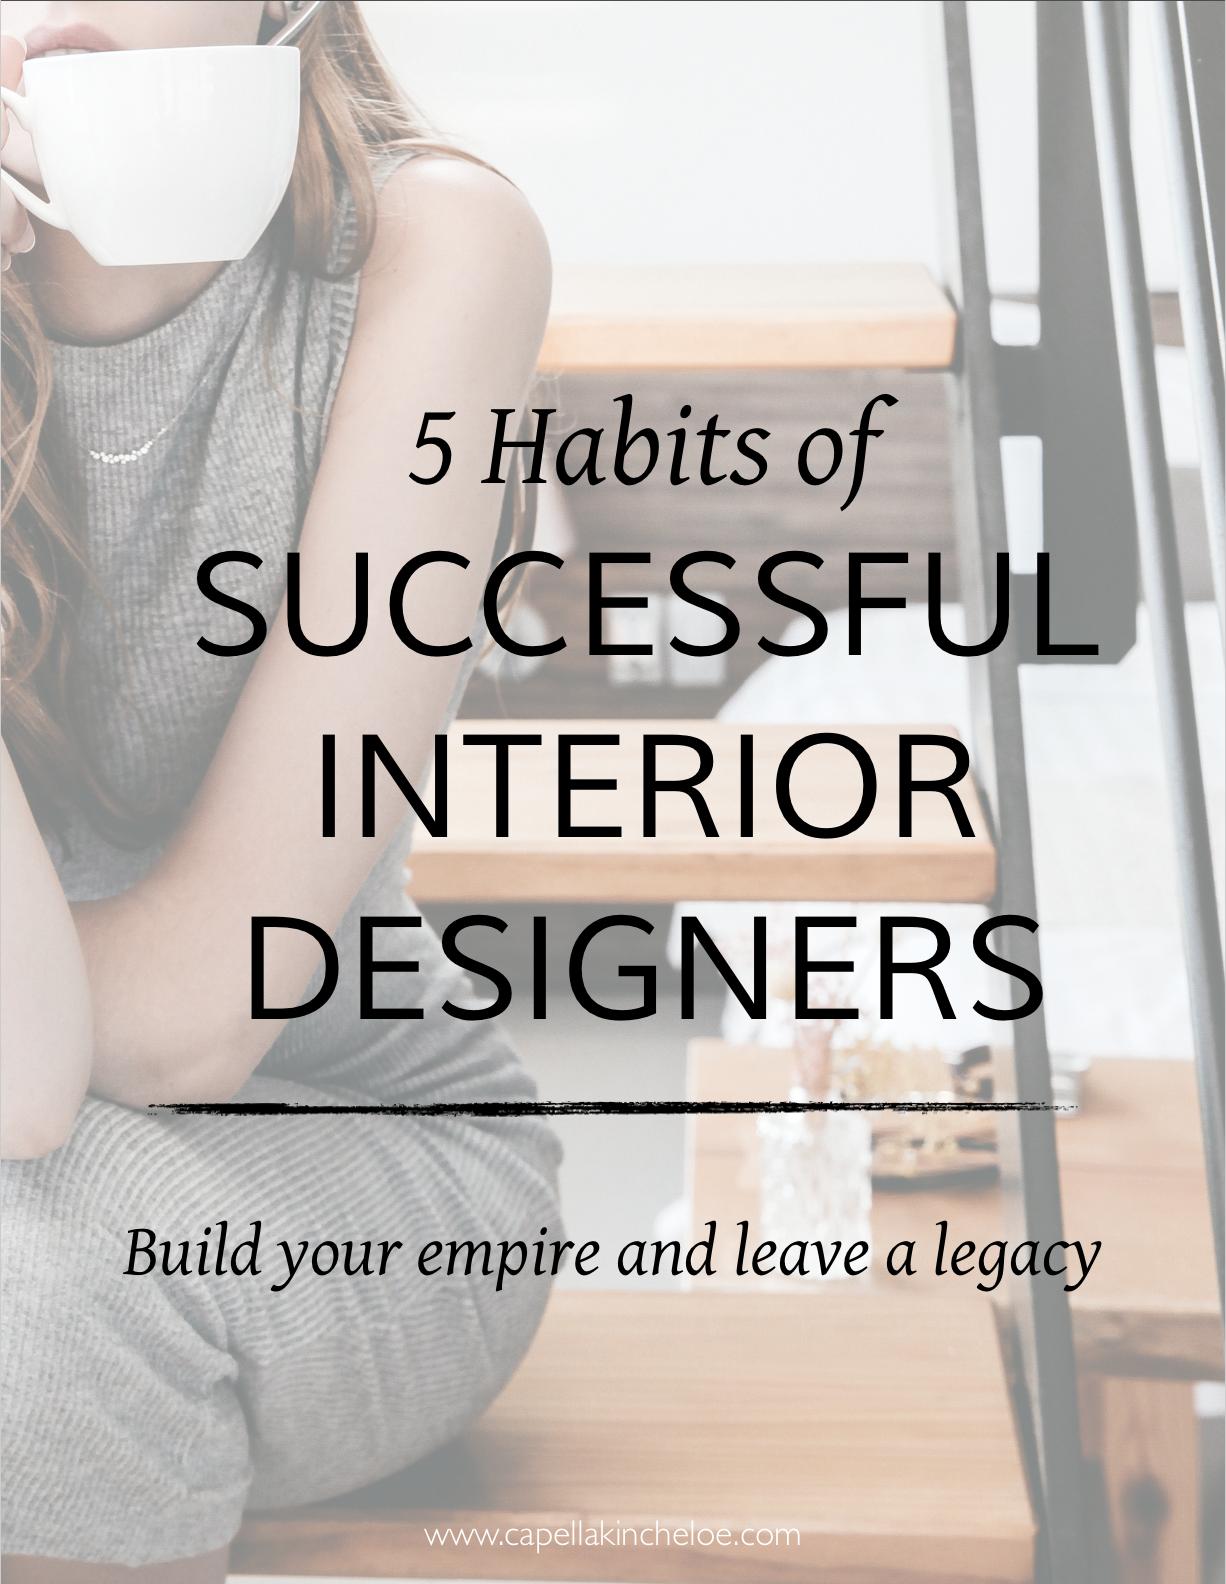 5 Habits Of Successful Interior Designers Capella Kincheloe Interior Design Career Traditional Interior Design Contemporary Interior Design